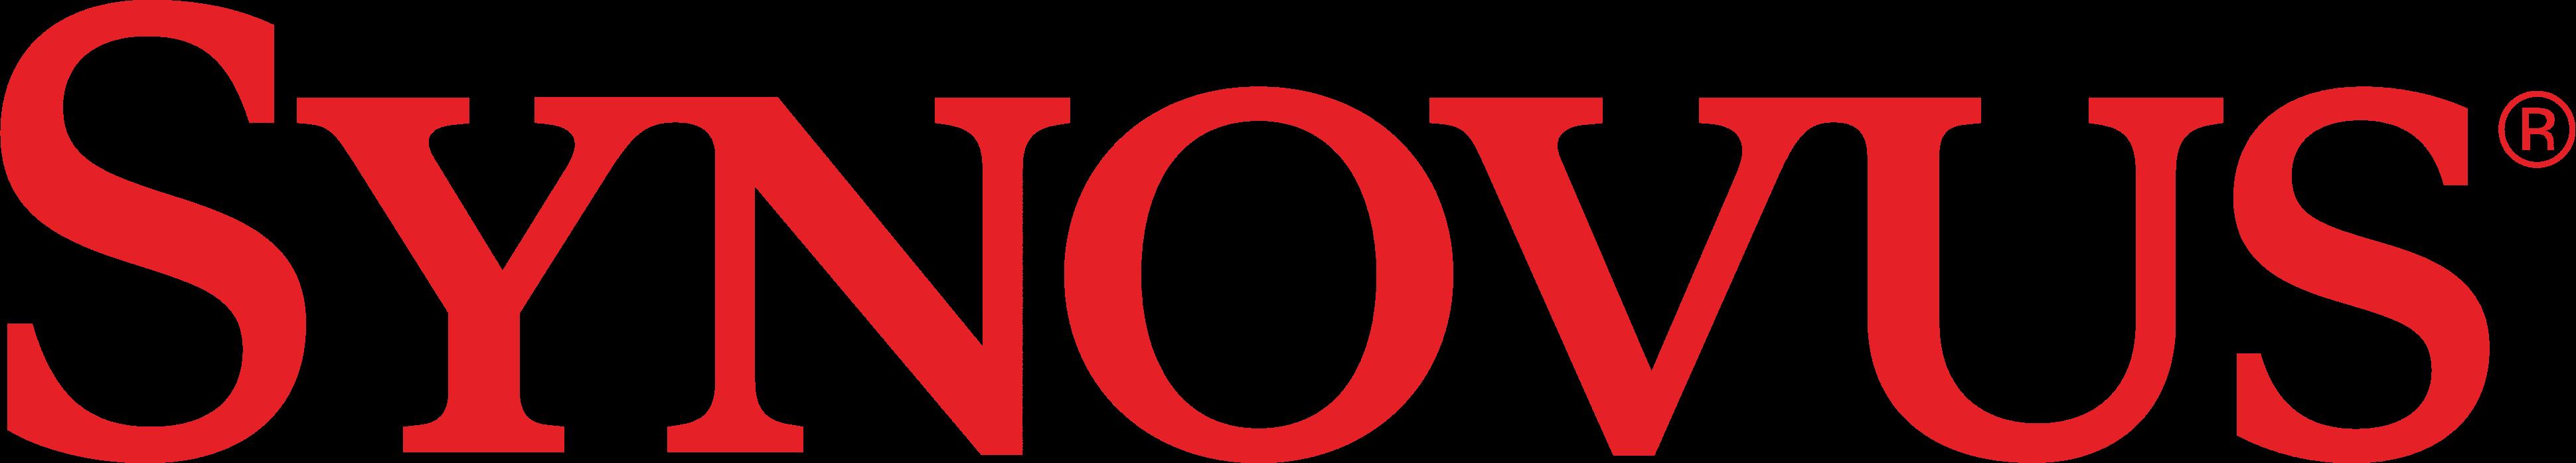 Synovus